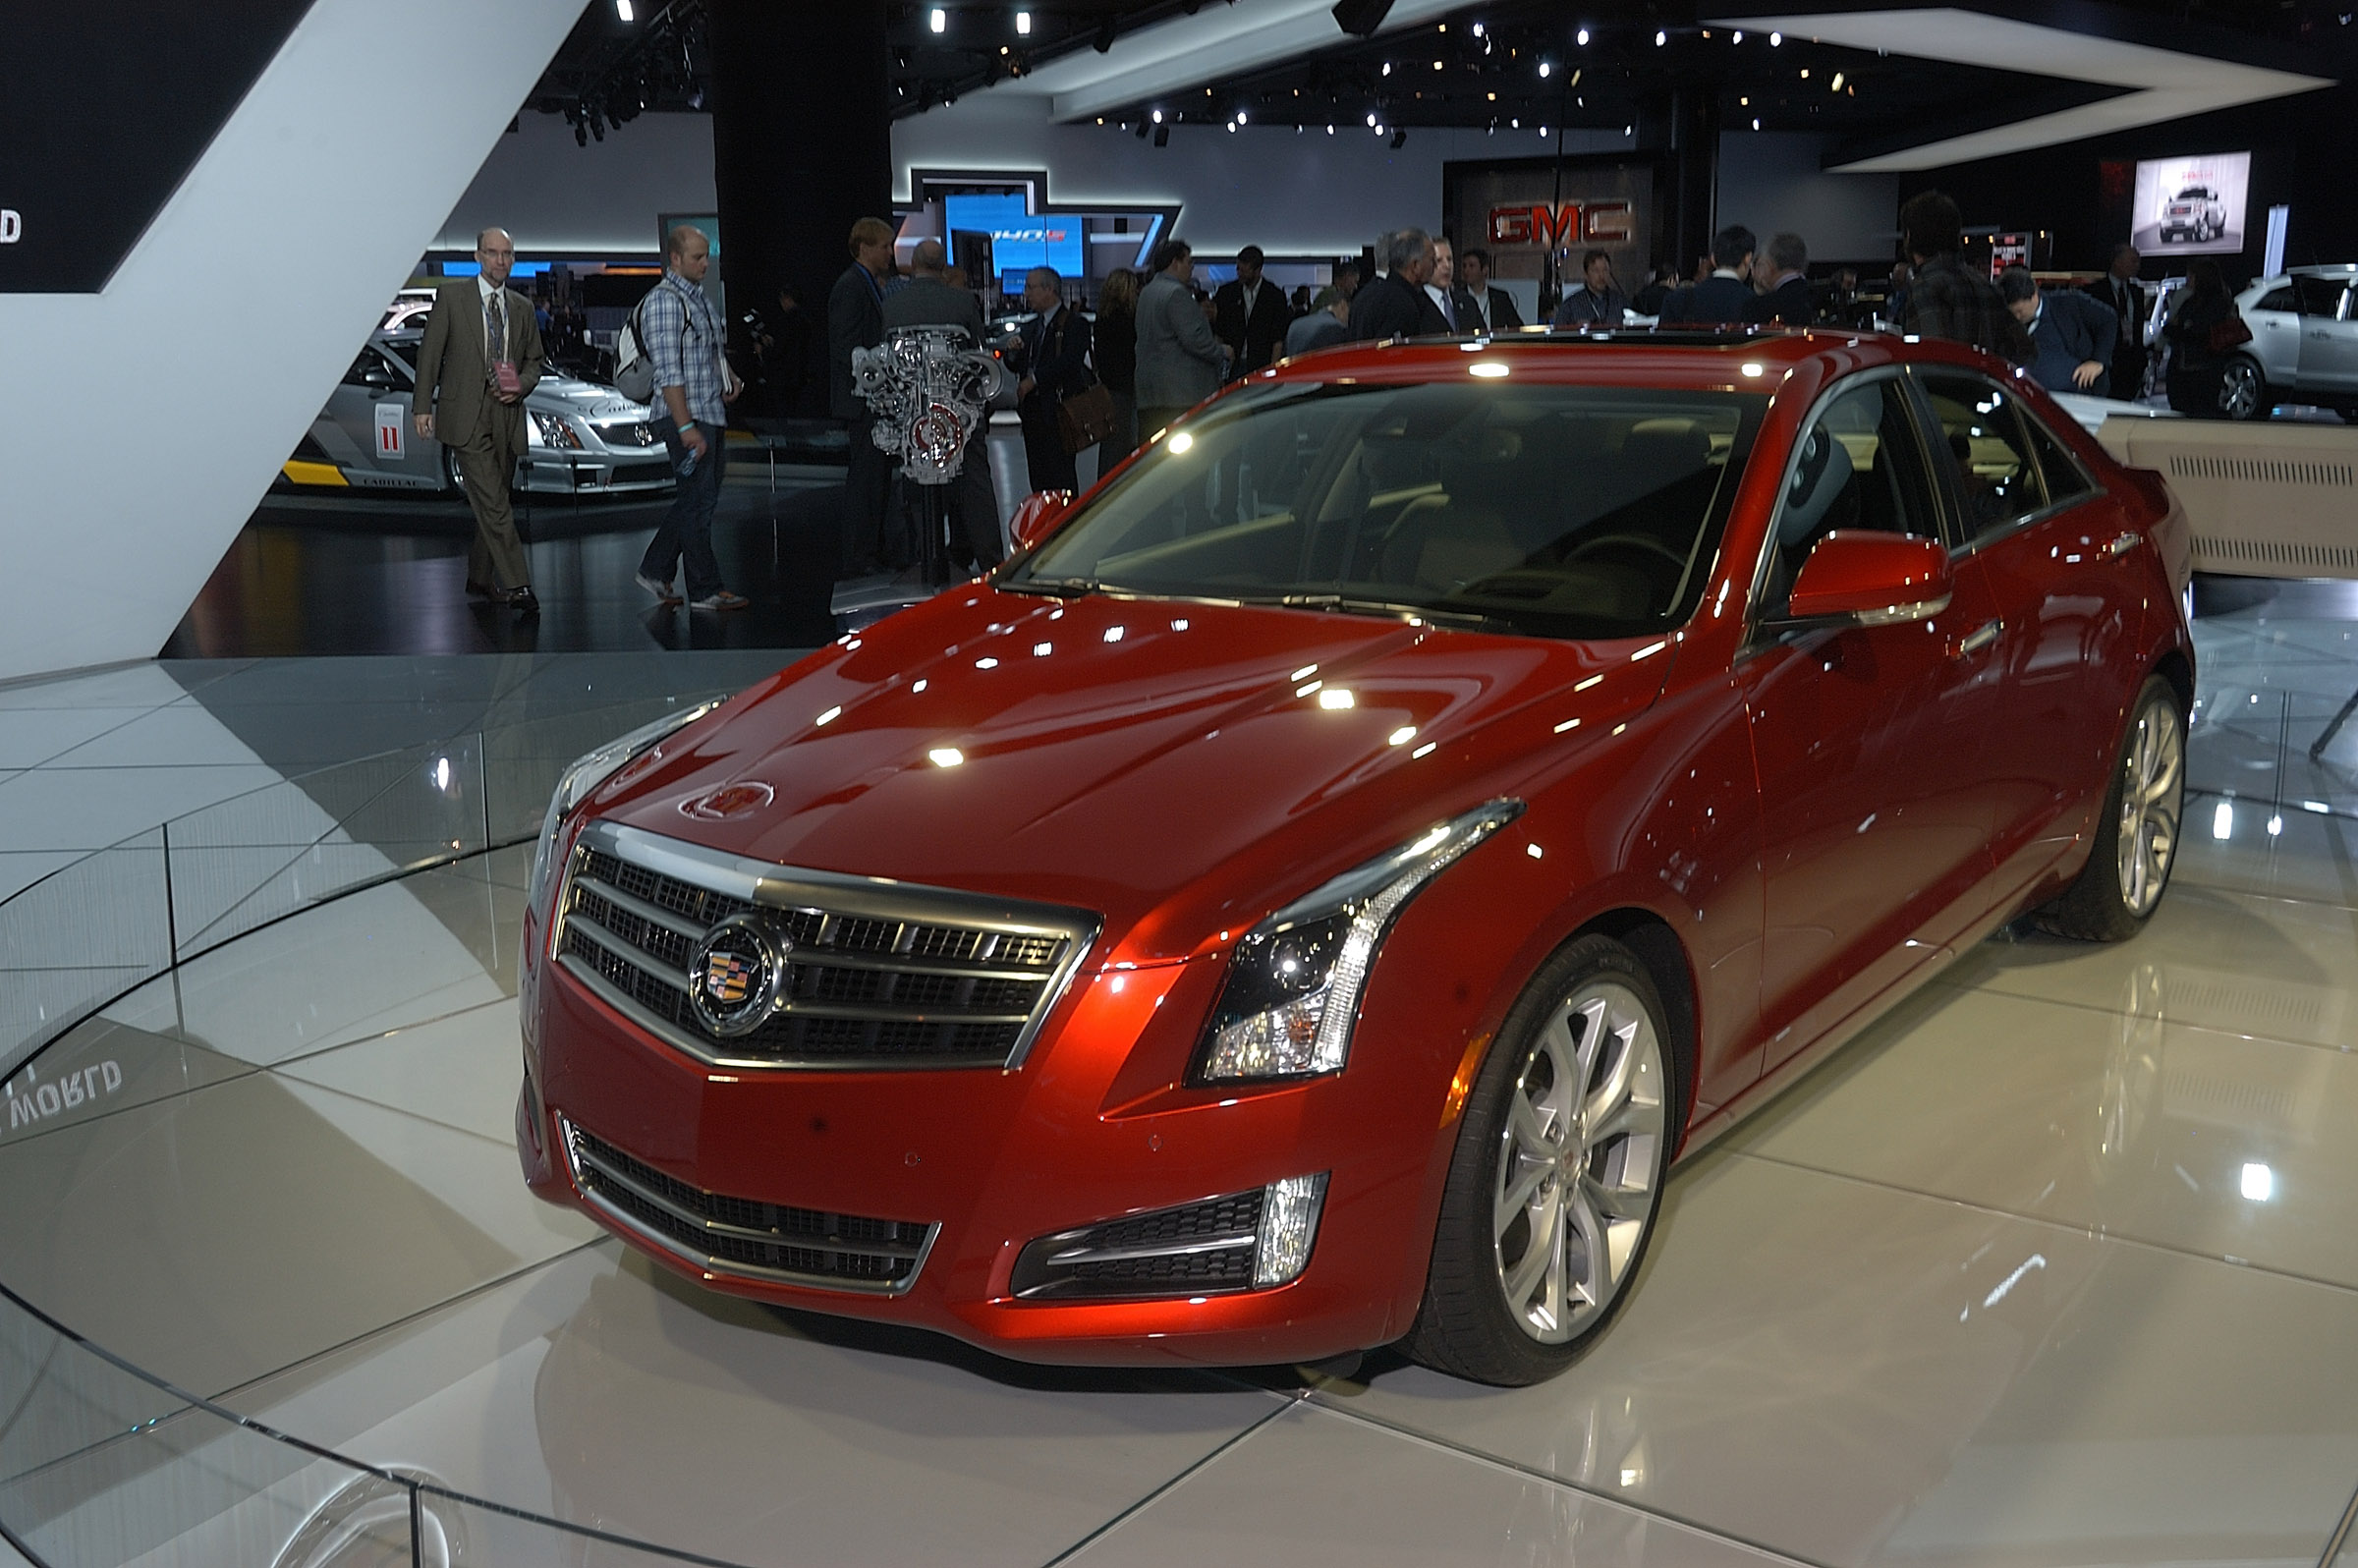 2013 Cadillac ATS Detroit 2012 - Picture 63319